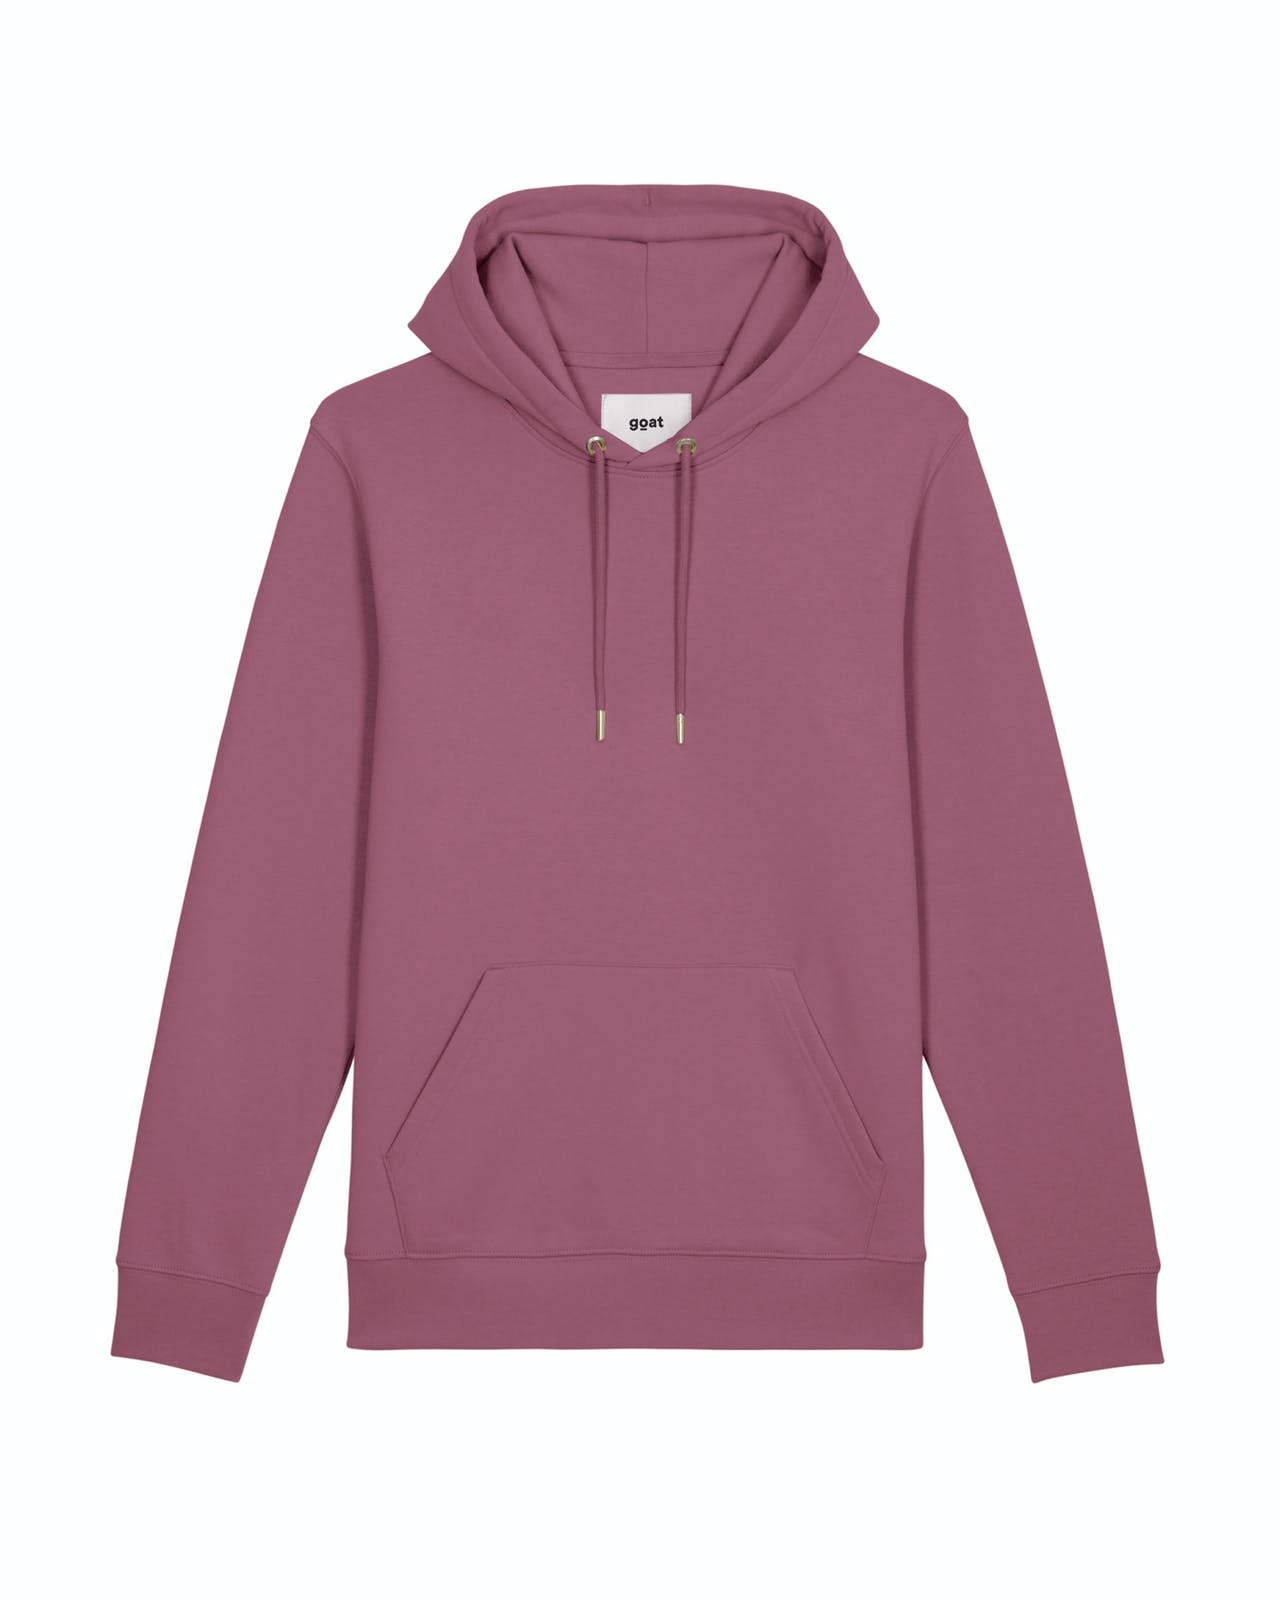 GOAT Apperal Avery Unisex Hooded Sweat Purple